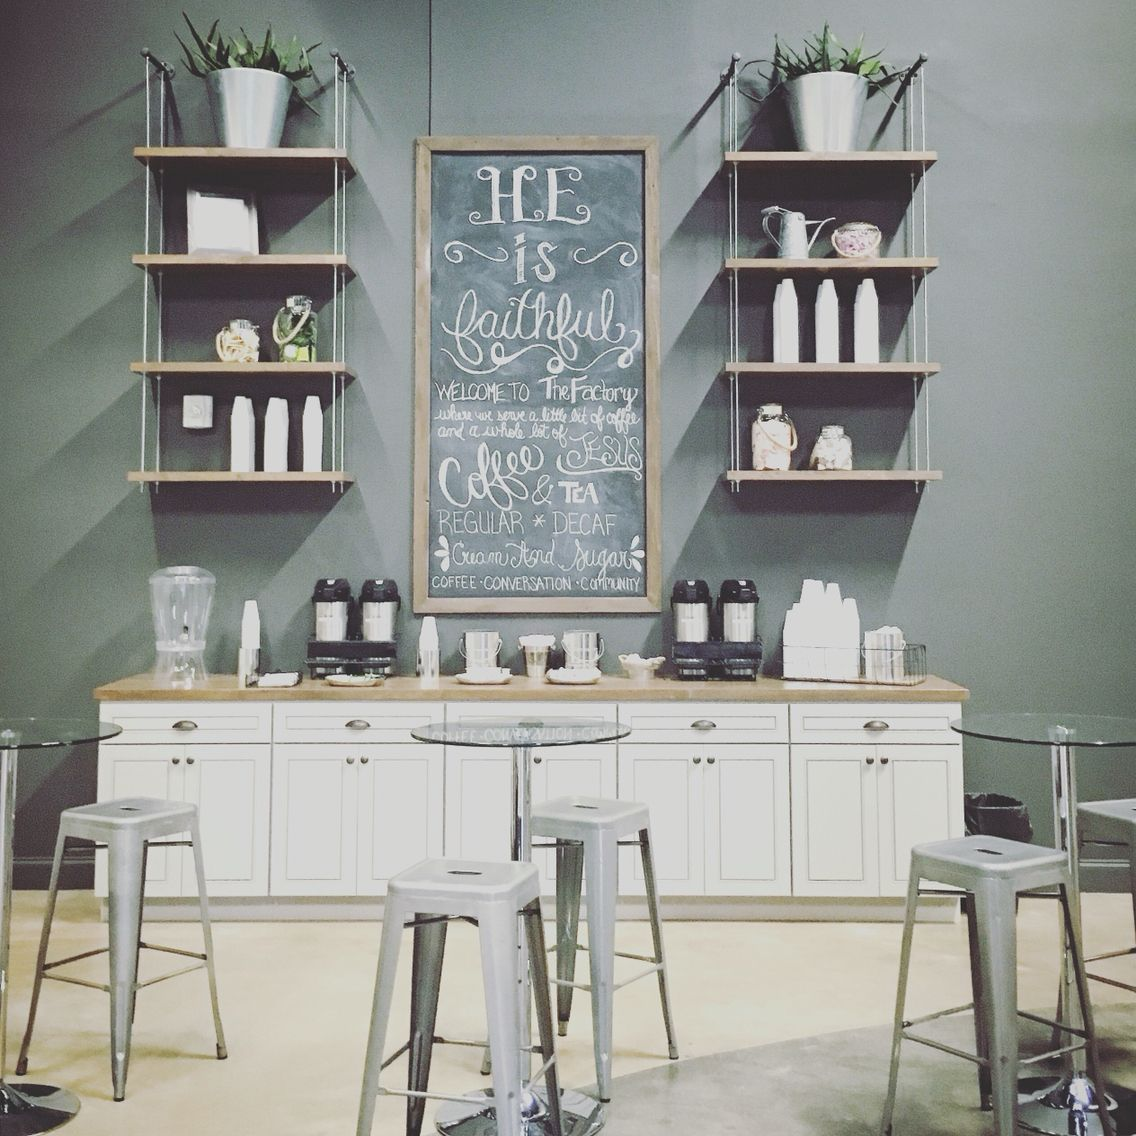 Office Coffee Bar Furniture: Custom Coffee Bar For Church. #thefunkydebutante